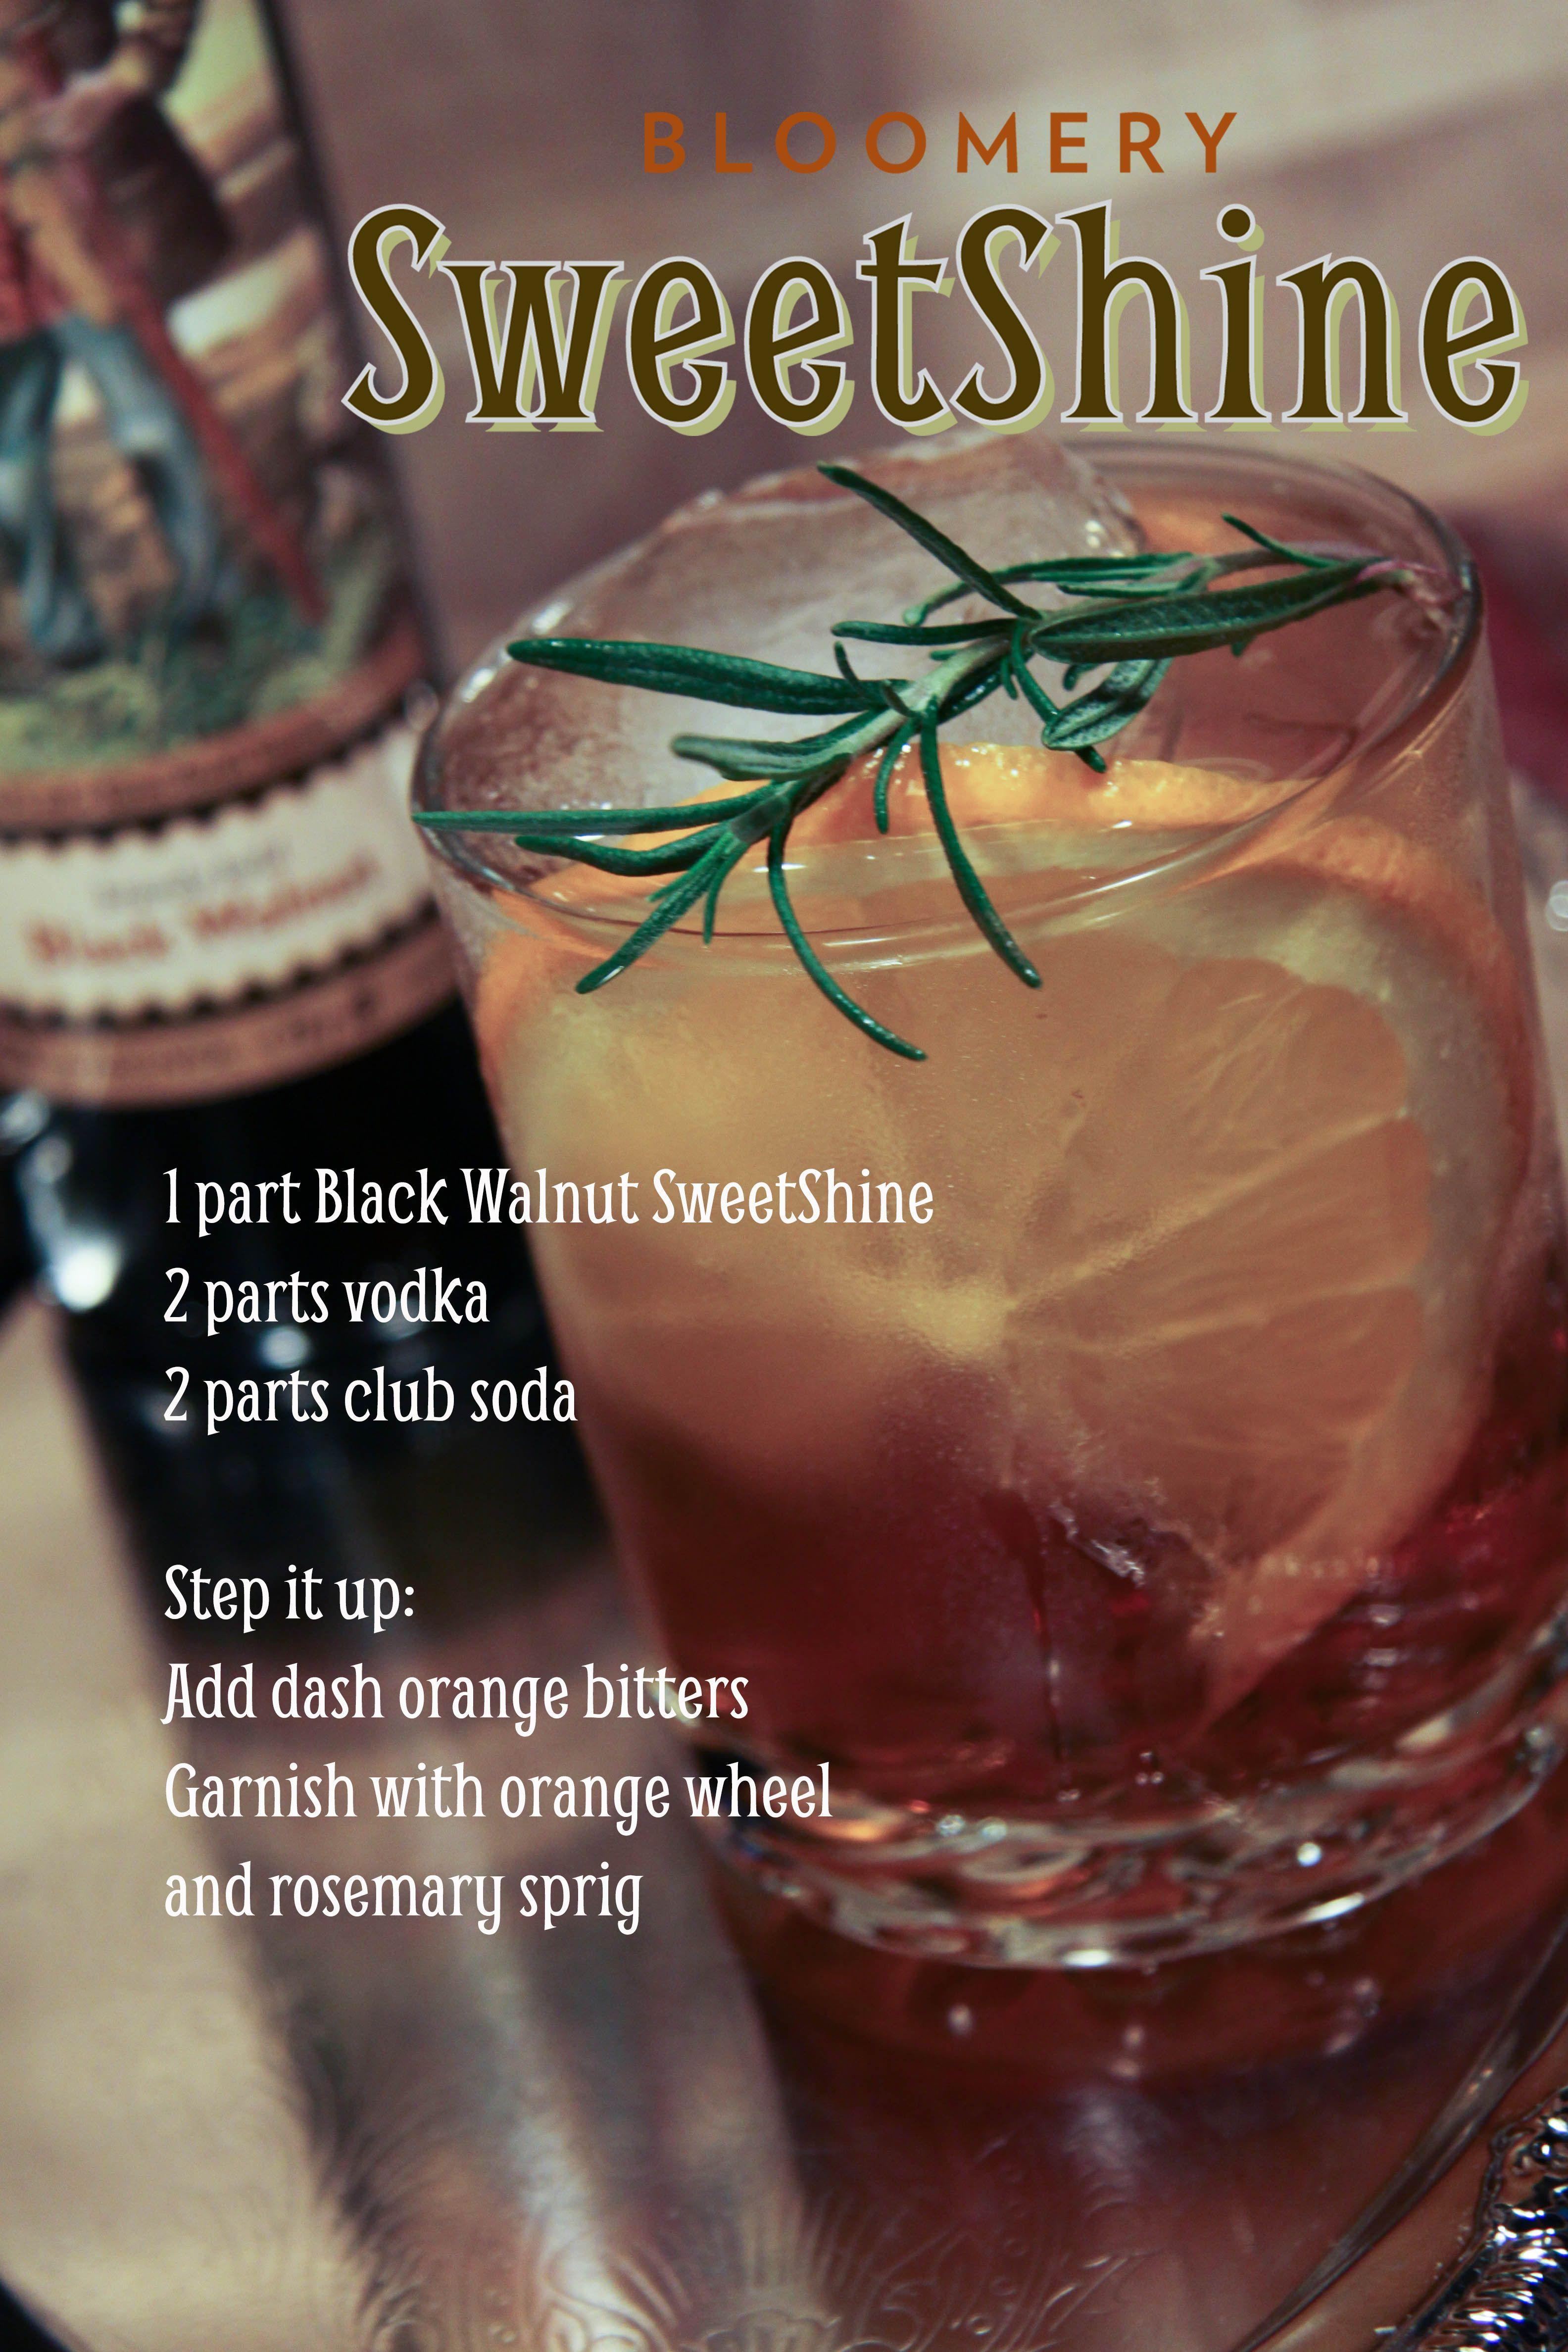 SweetShine, cocktail, moonshine, vodka, mixology, Black